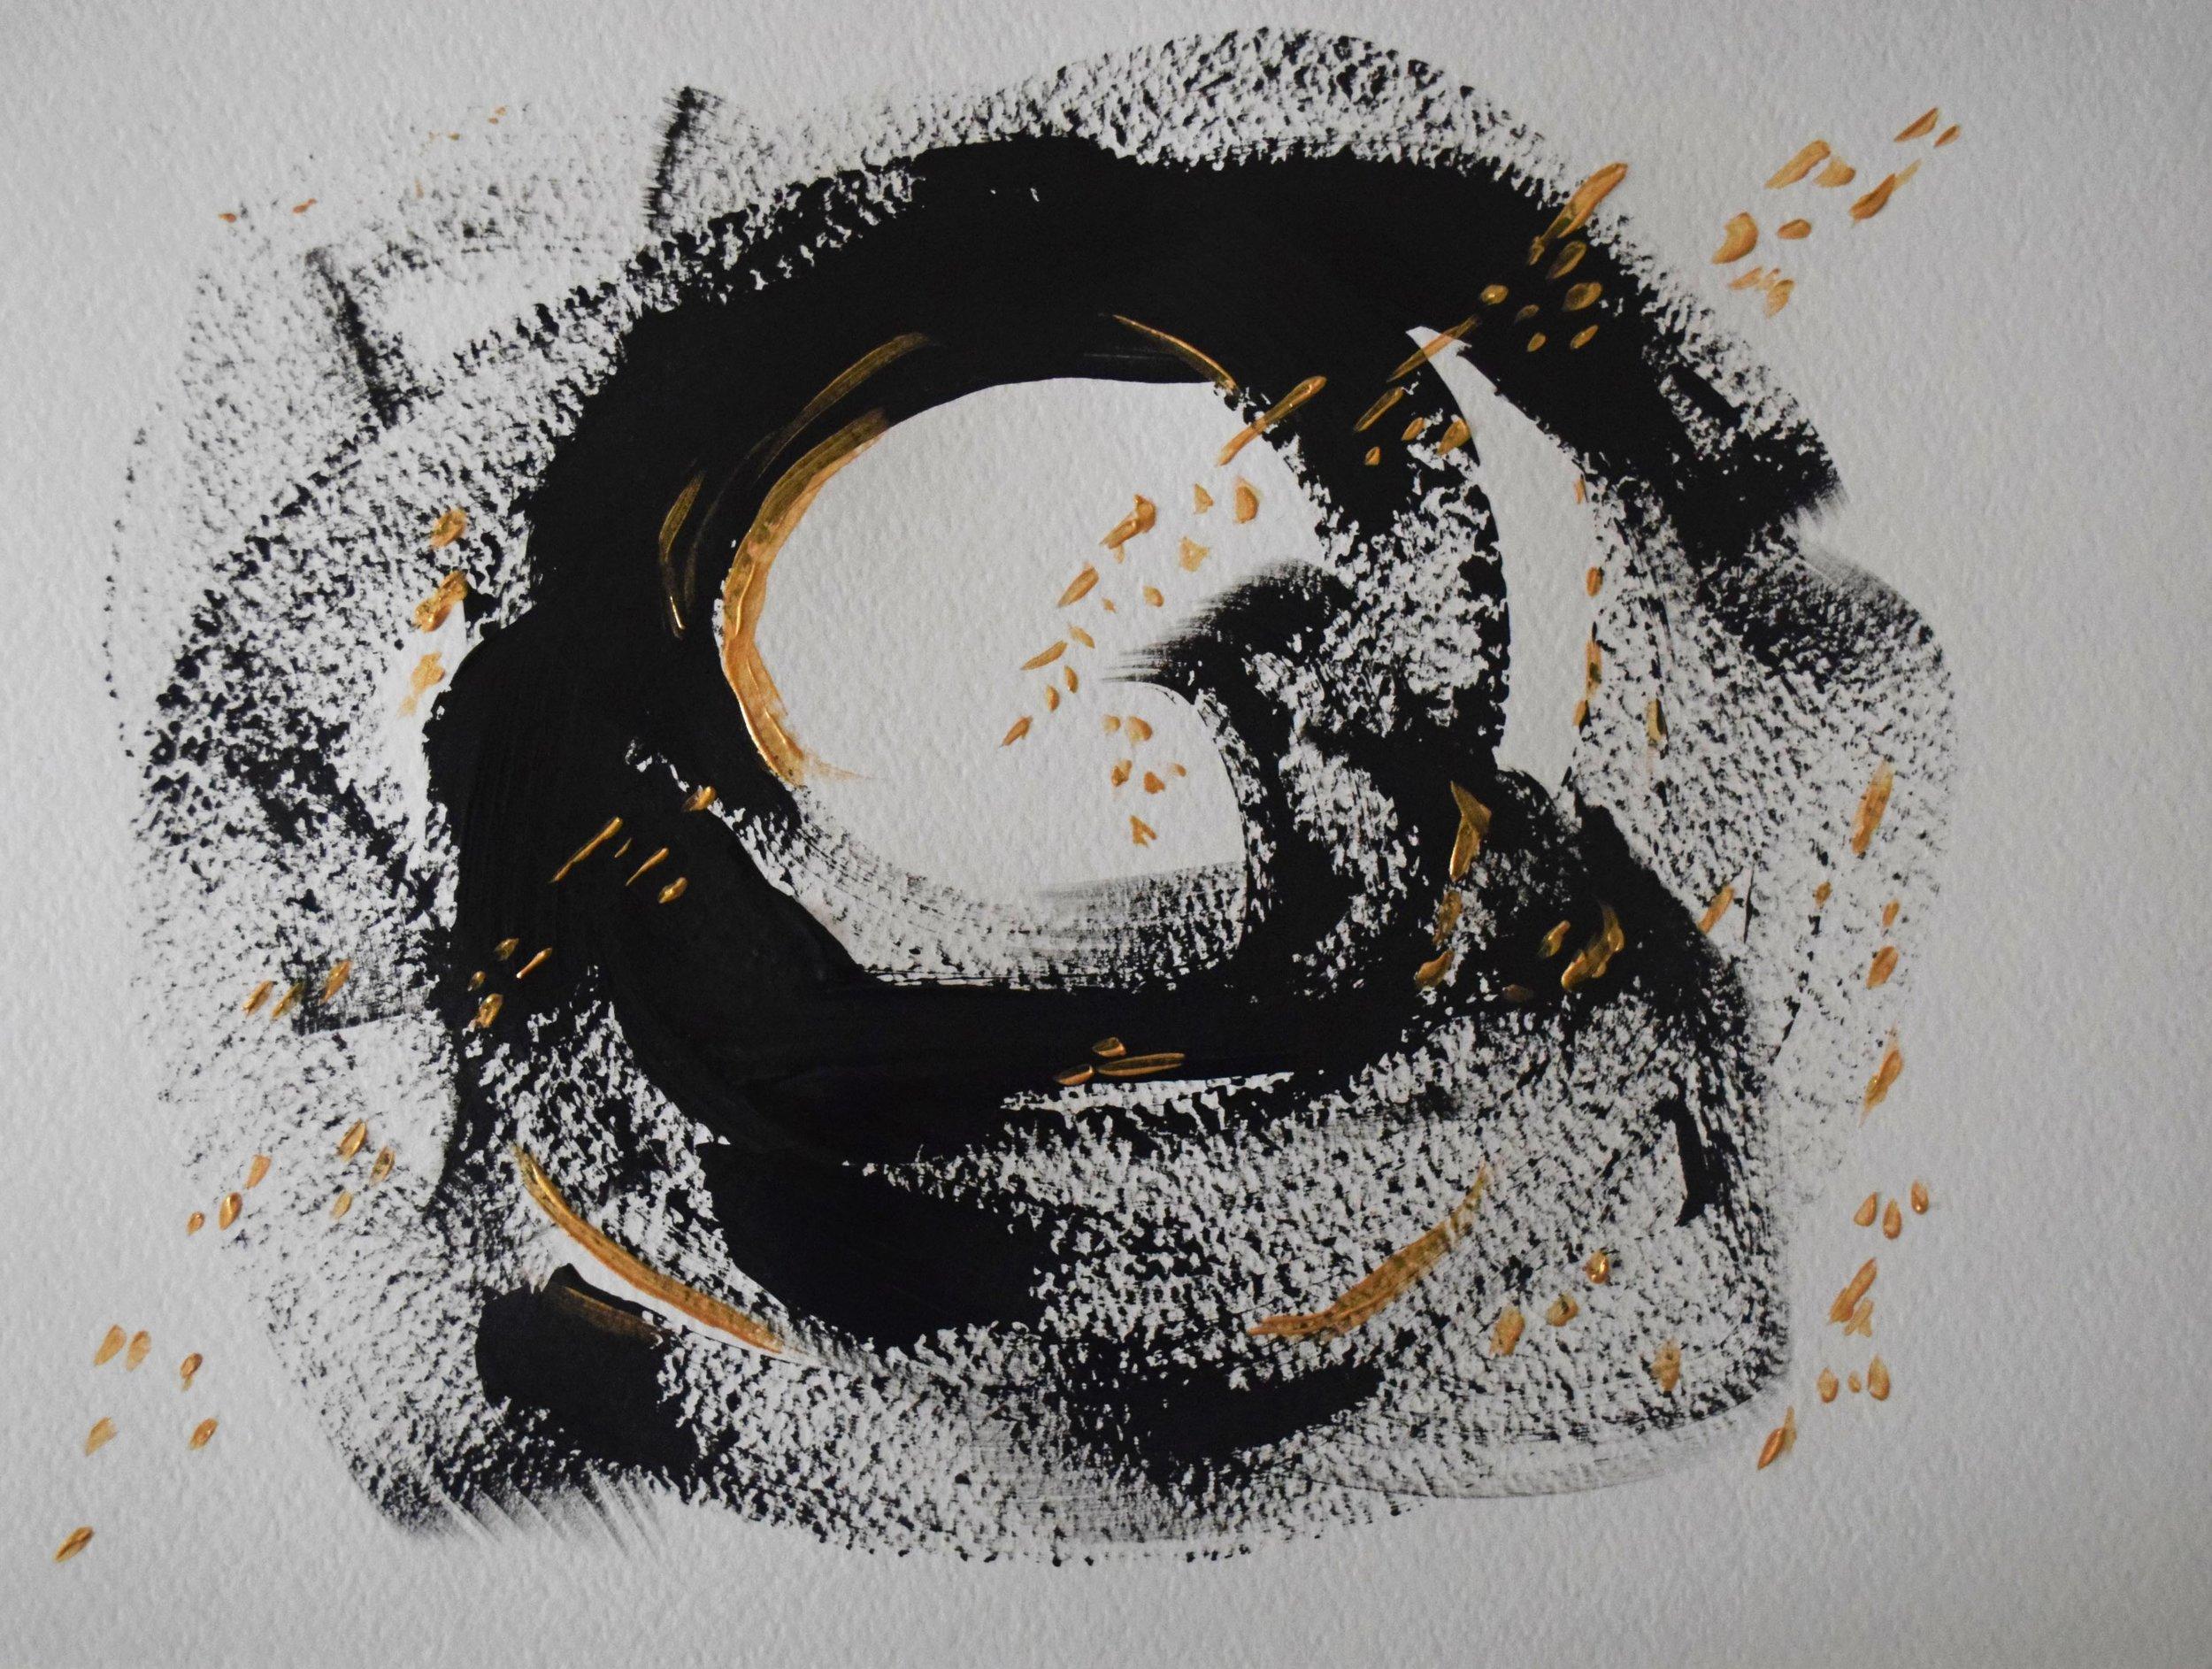 Abstract art ©Detail Movement